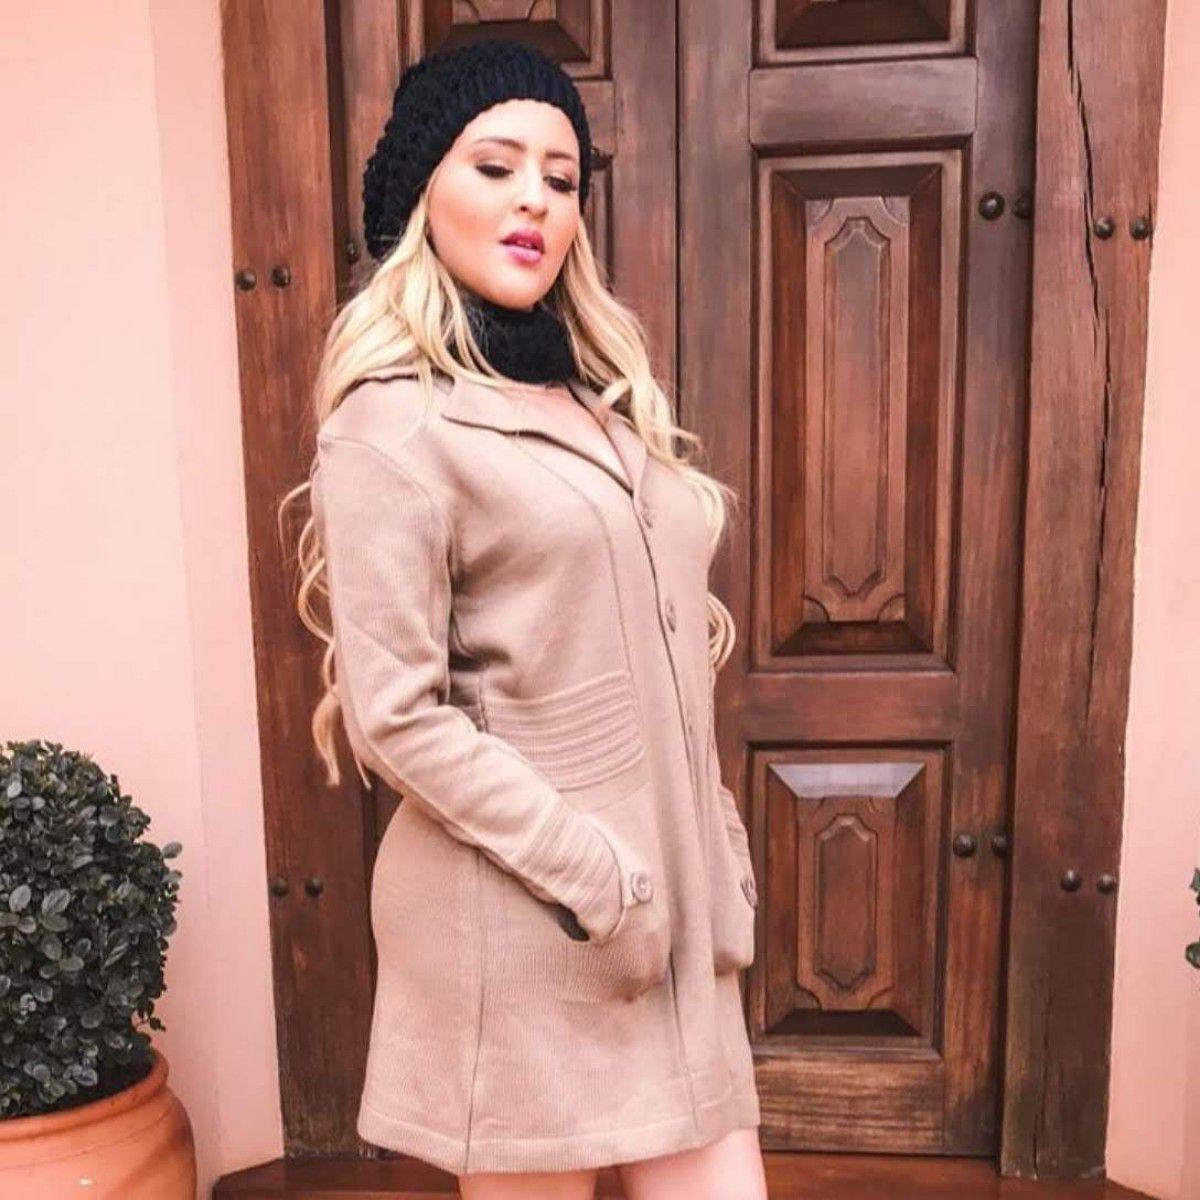 Sobre Tudo Tricot Casaco Inverno Moda Feminina K75